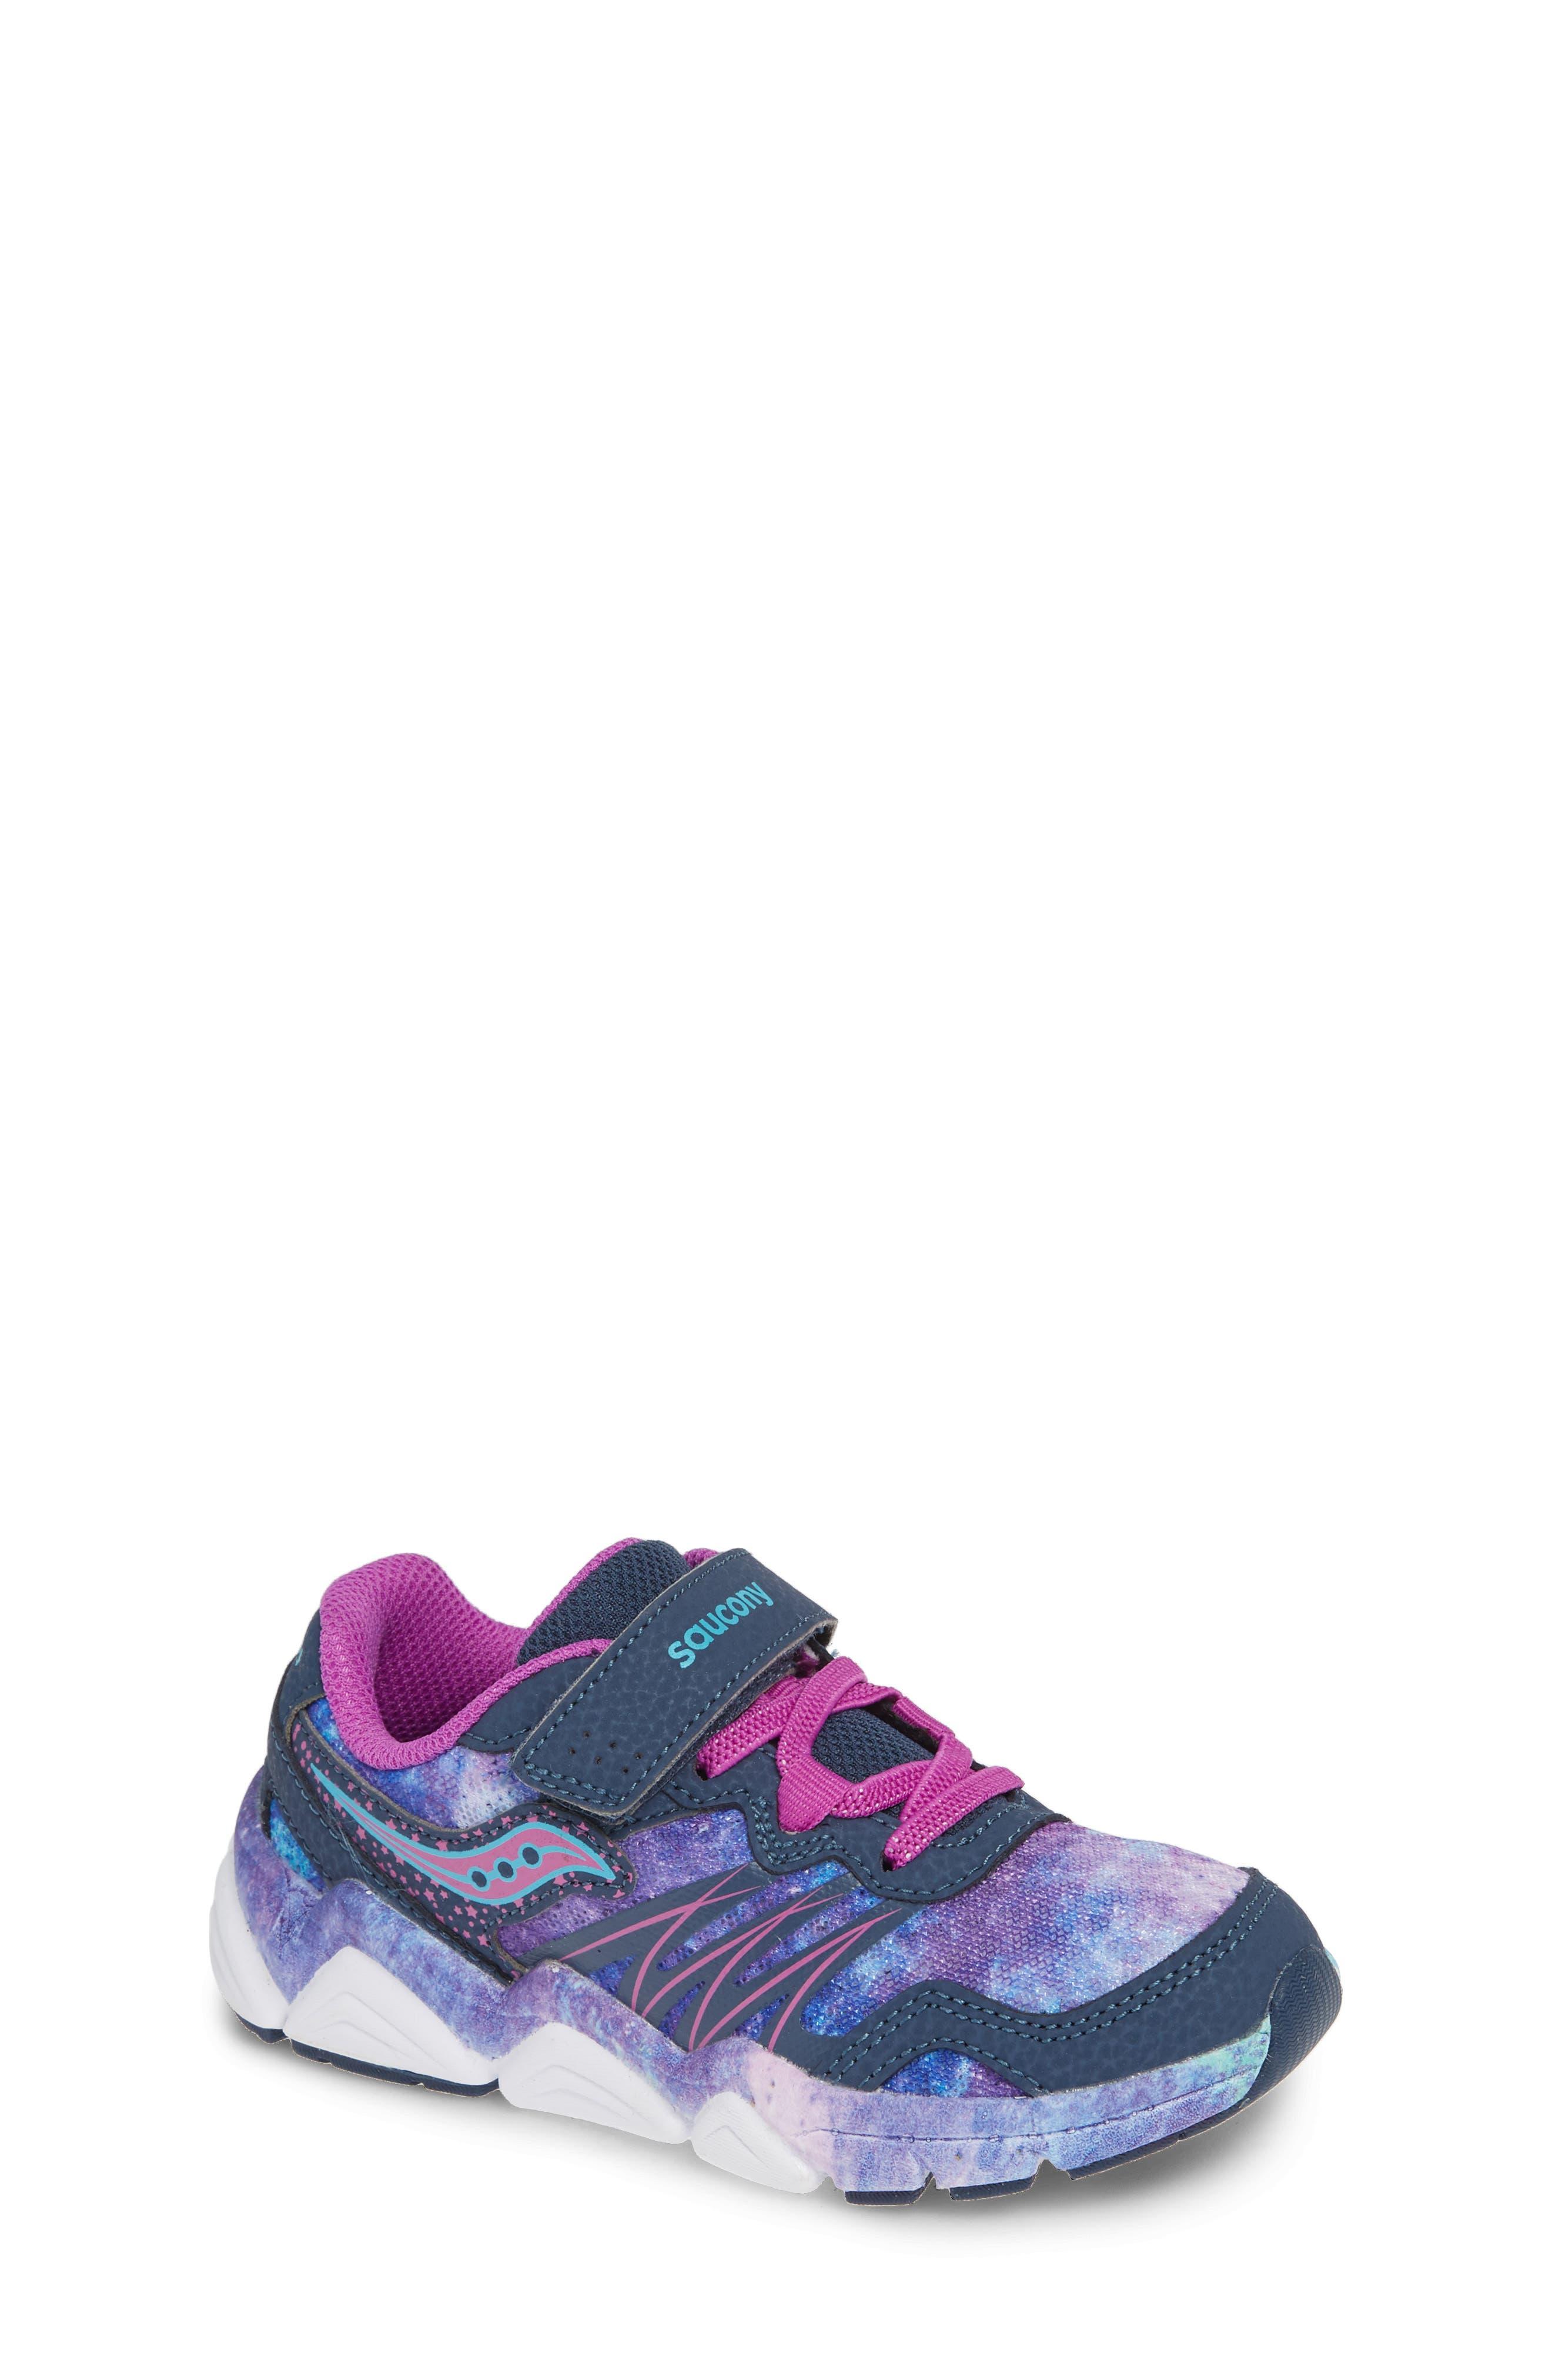 Boys Saucony Kotaro Flash Sneaker Size 2 W  Purple